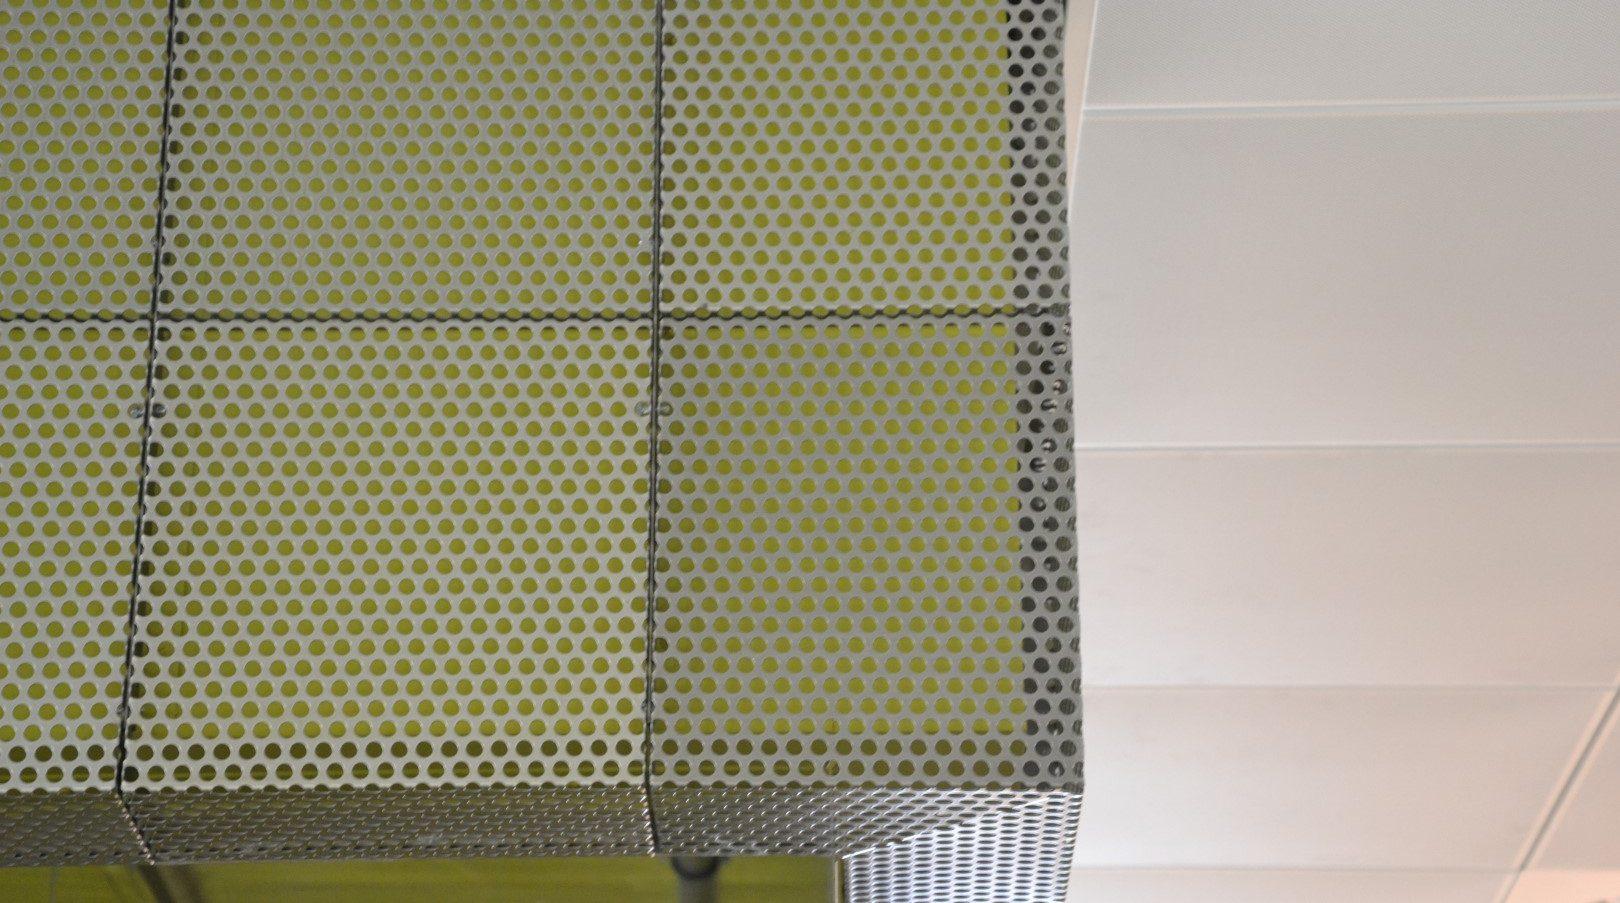 Hoekdetail interieurbekleding Amstelcampus Amsterdam MD Designperforatie